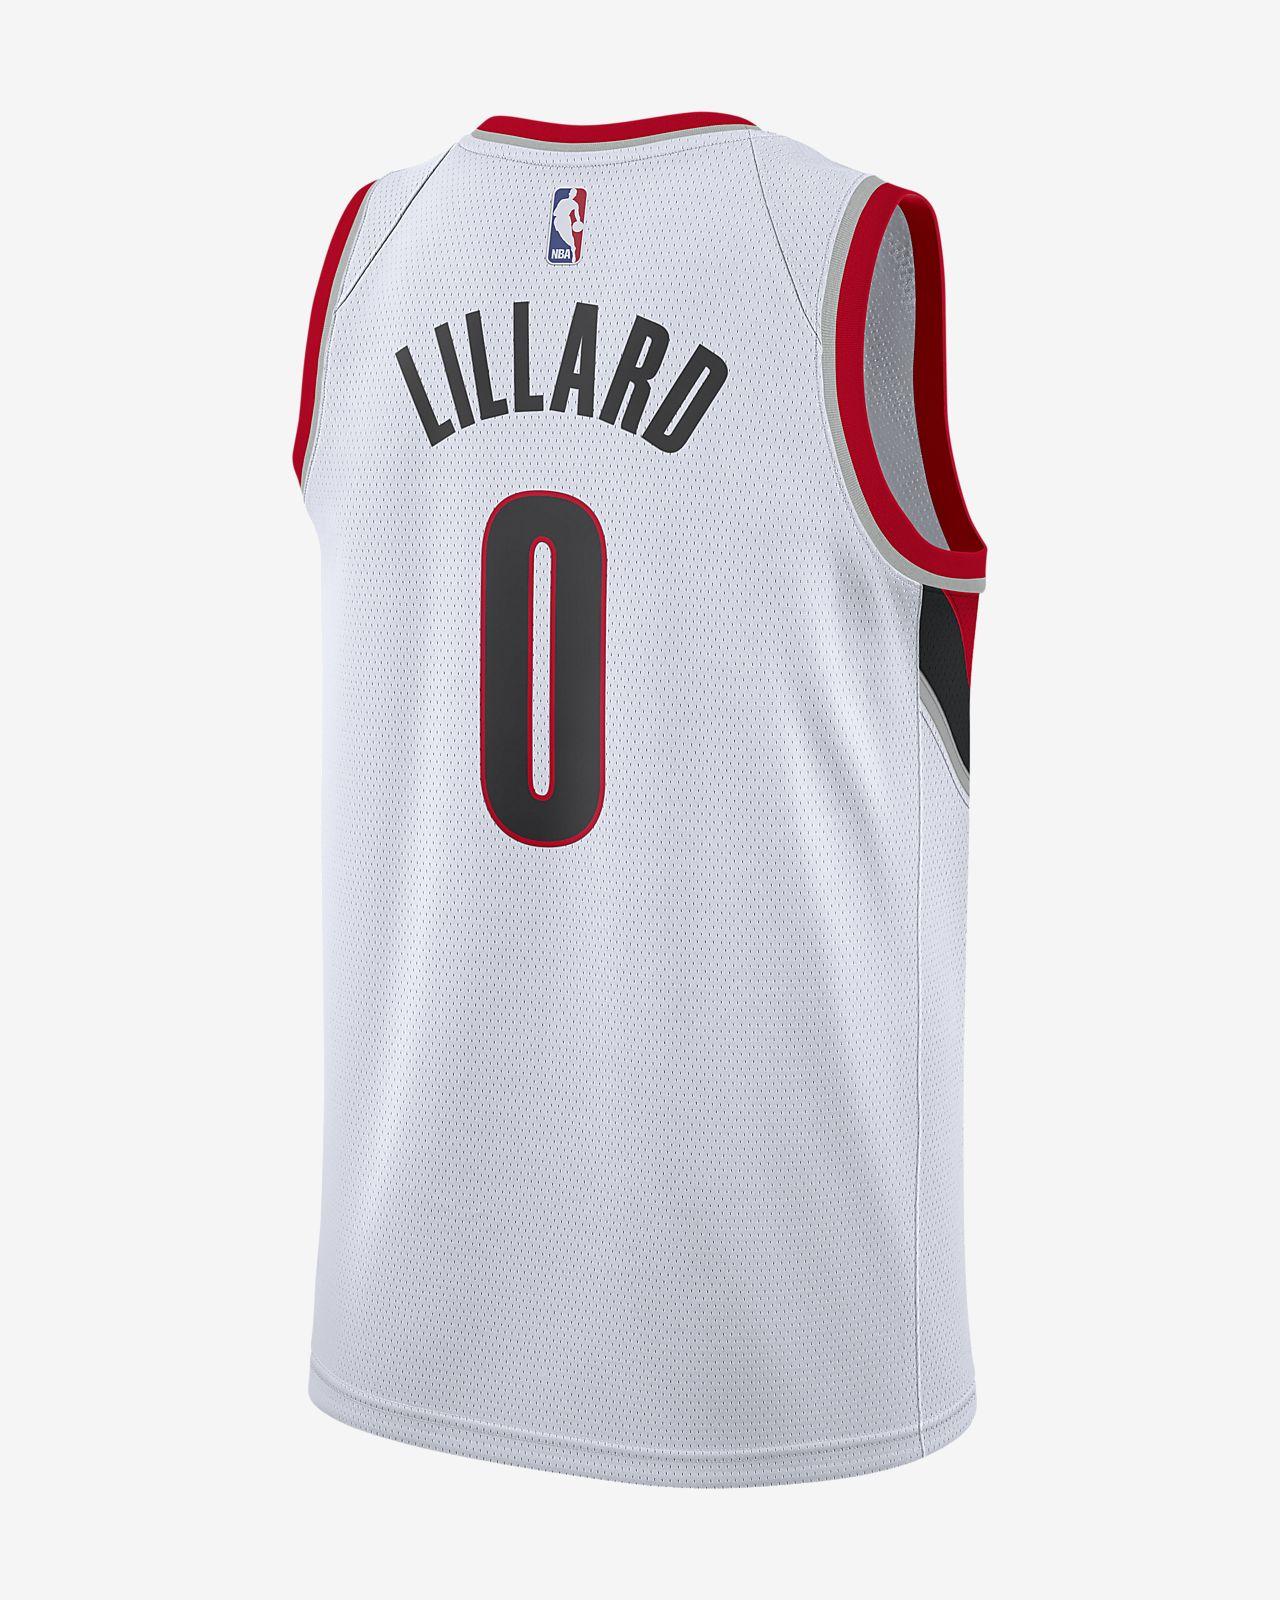 75320e4fcdf ... Damian Lillard Association Edition Swingman (Portland Trail Blazers)  Men's Nike NBA Connected Jersey